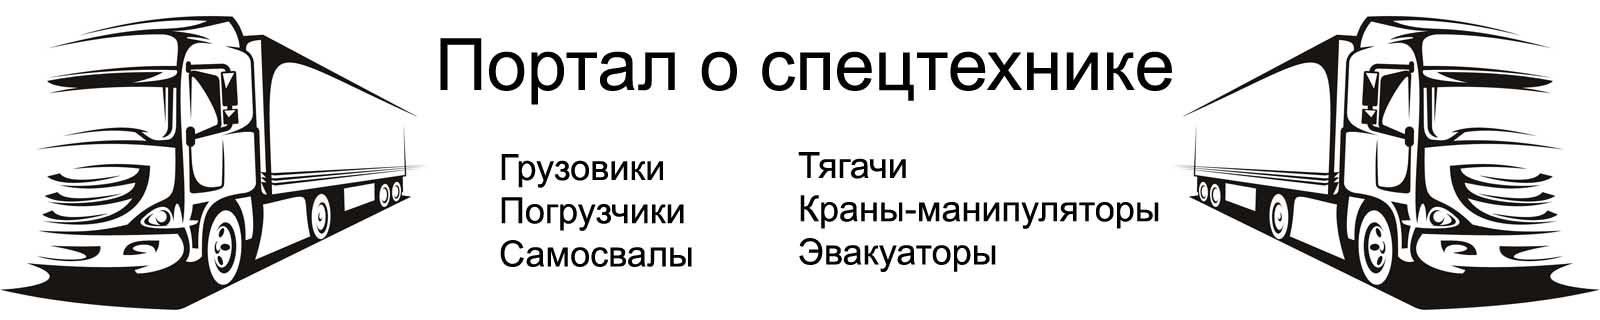 https://pedcollkomi.ru/